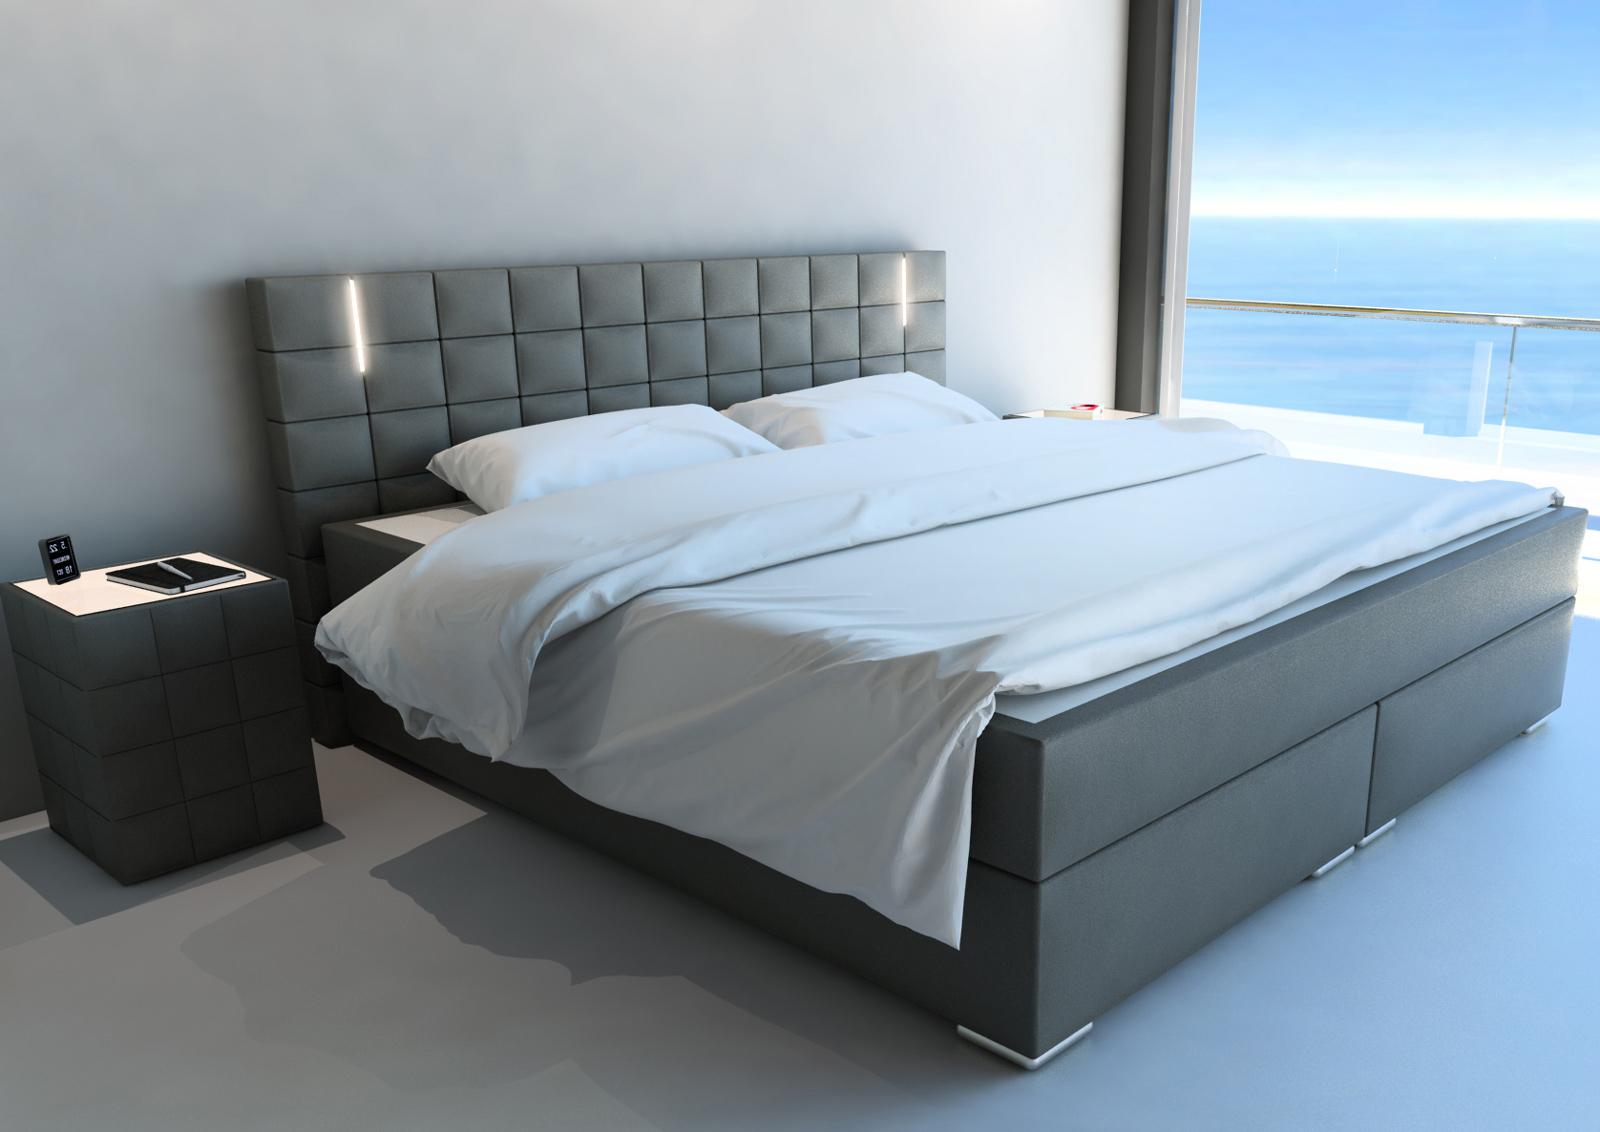 sam boxspringbett hotelbett led beleuchtung 200x200 cm grau boston. Black Bedroom Furniture Sets. Home Design Ideas